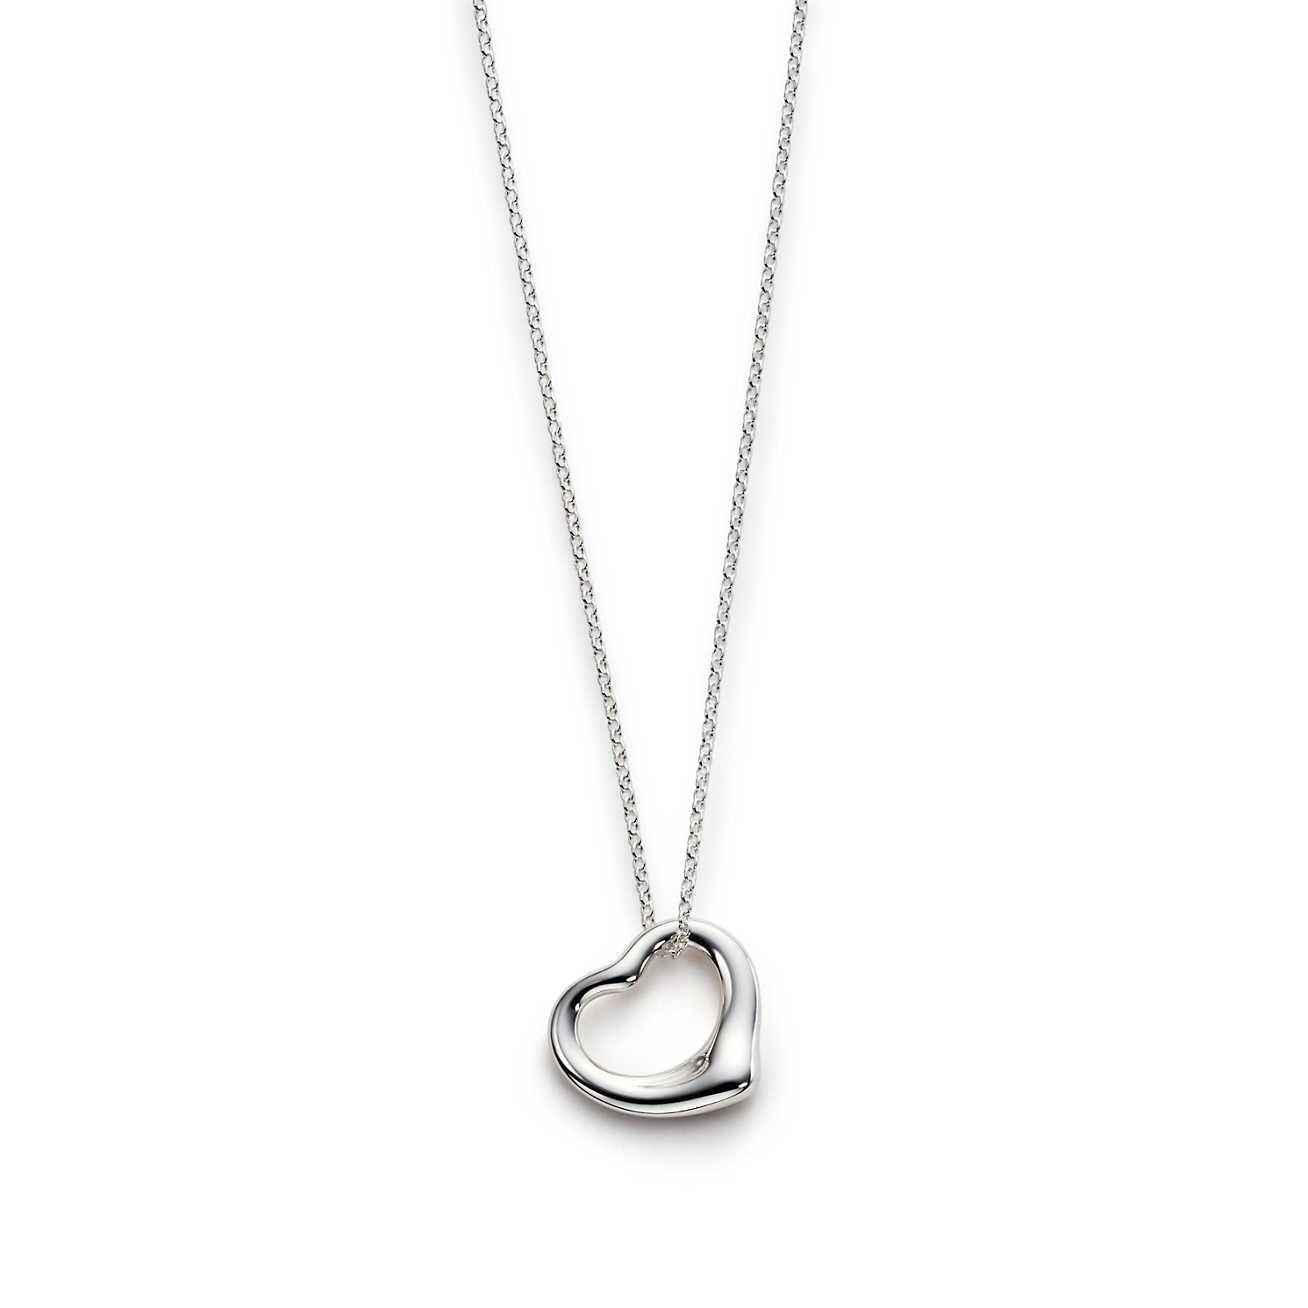 b3655ef5f2f1 Elsa Peretti® Open Heart pendant in sterling silver.